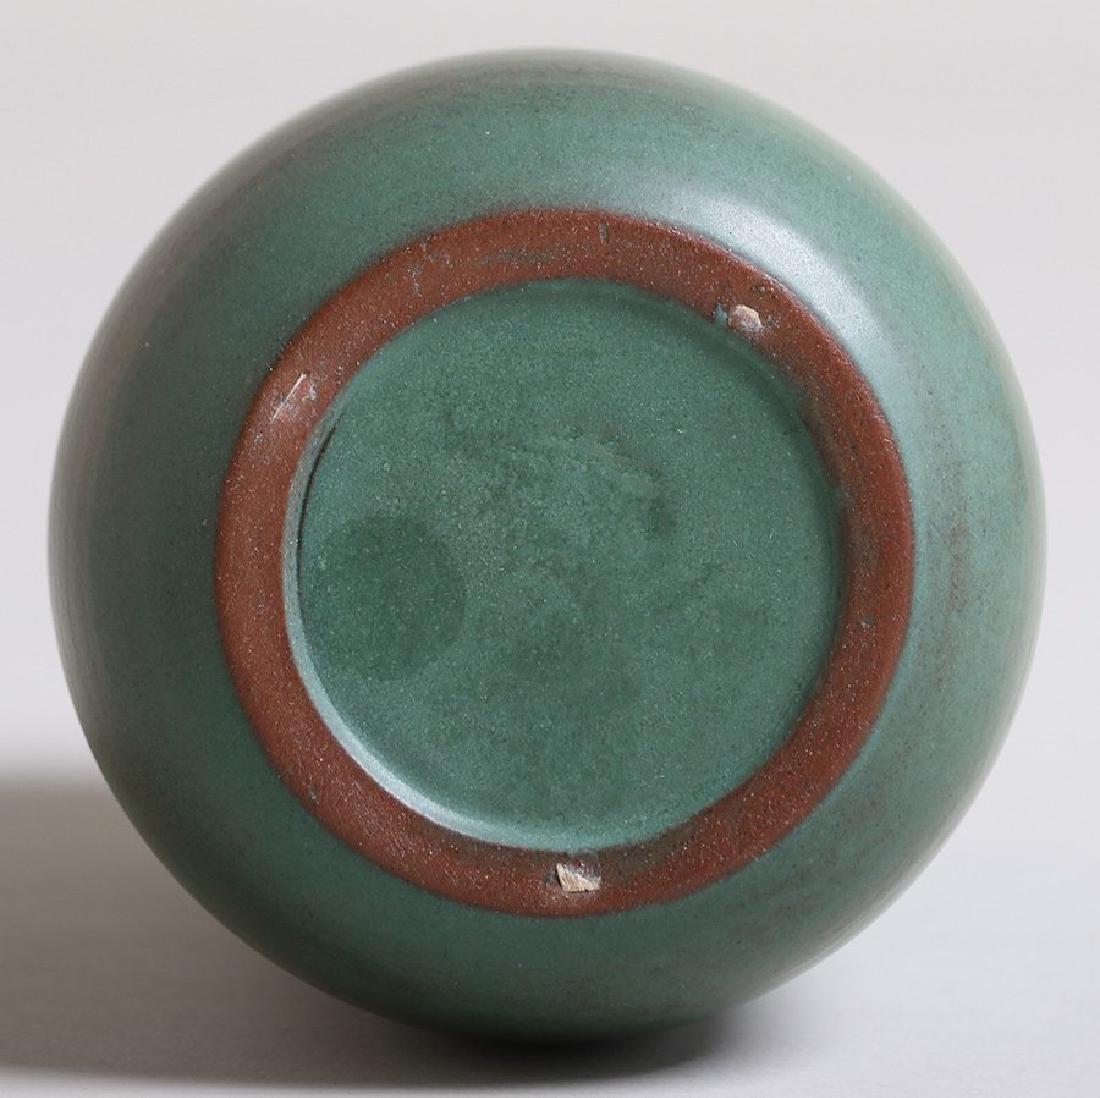 Marblehead Pottery Matte Green Vase - 3